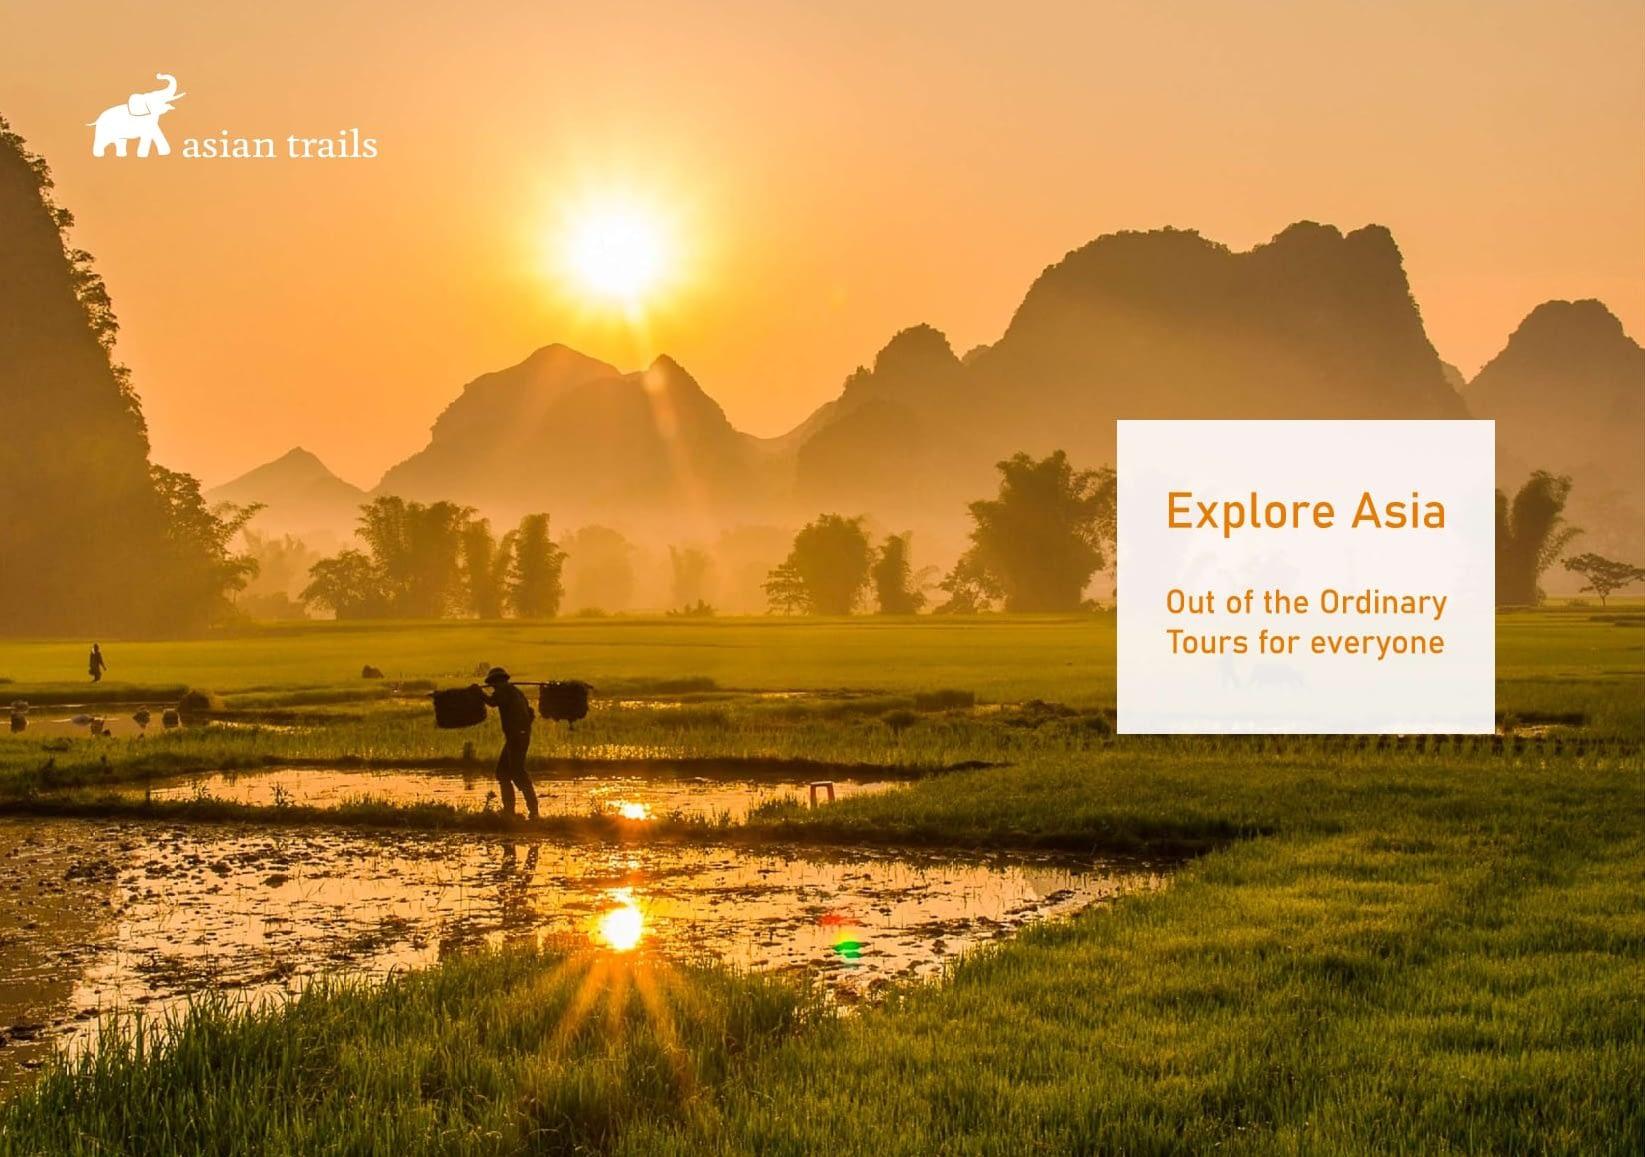 asian-trails-explore-asia-2020-2021